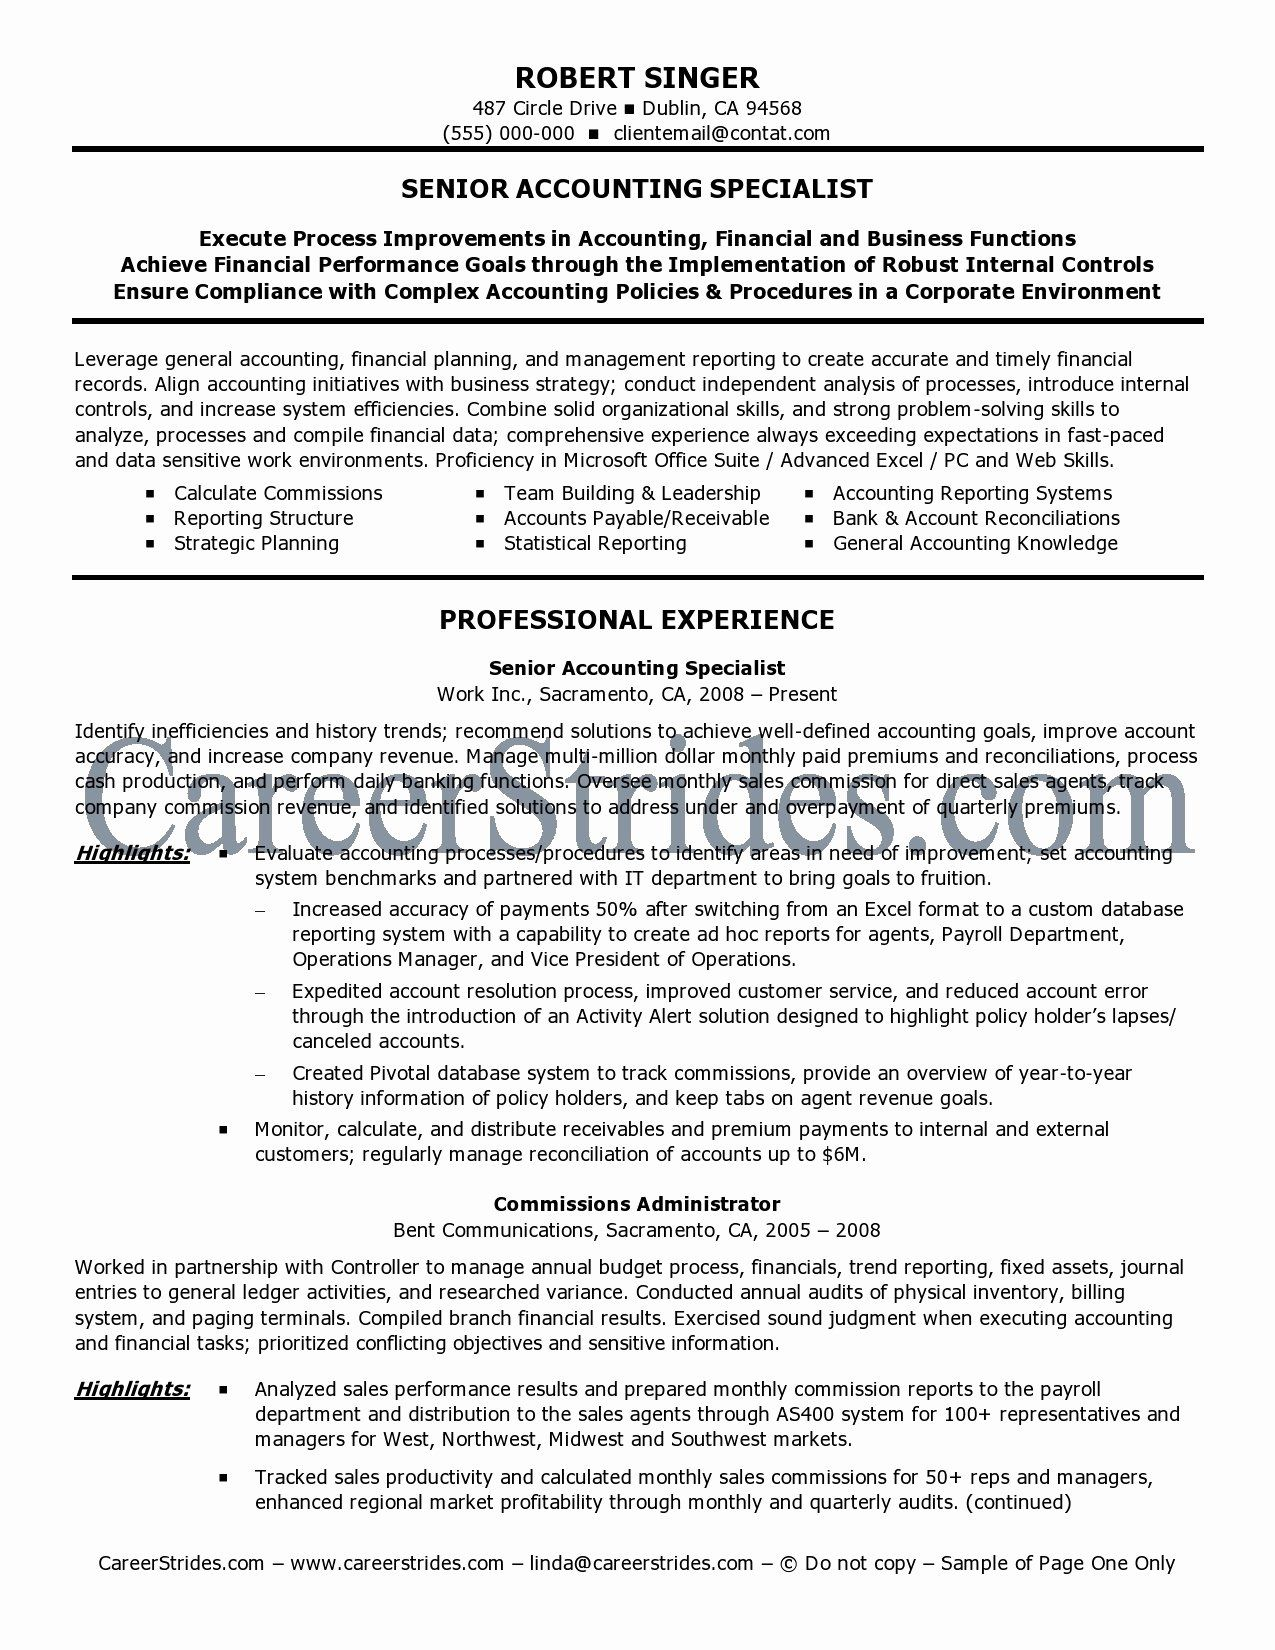 25 Senior Accountant Resume Sample in 2020 Accountant